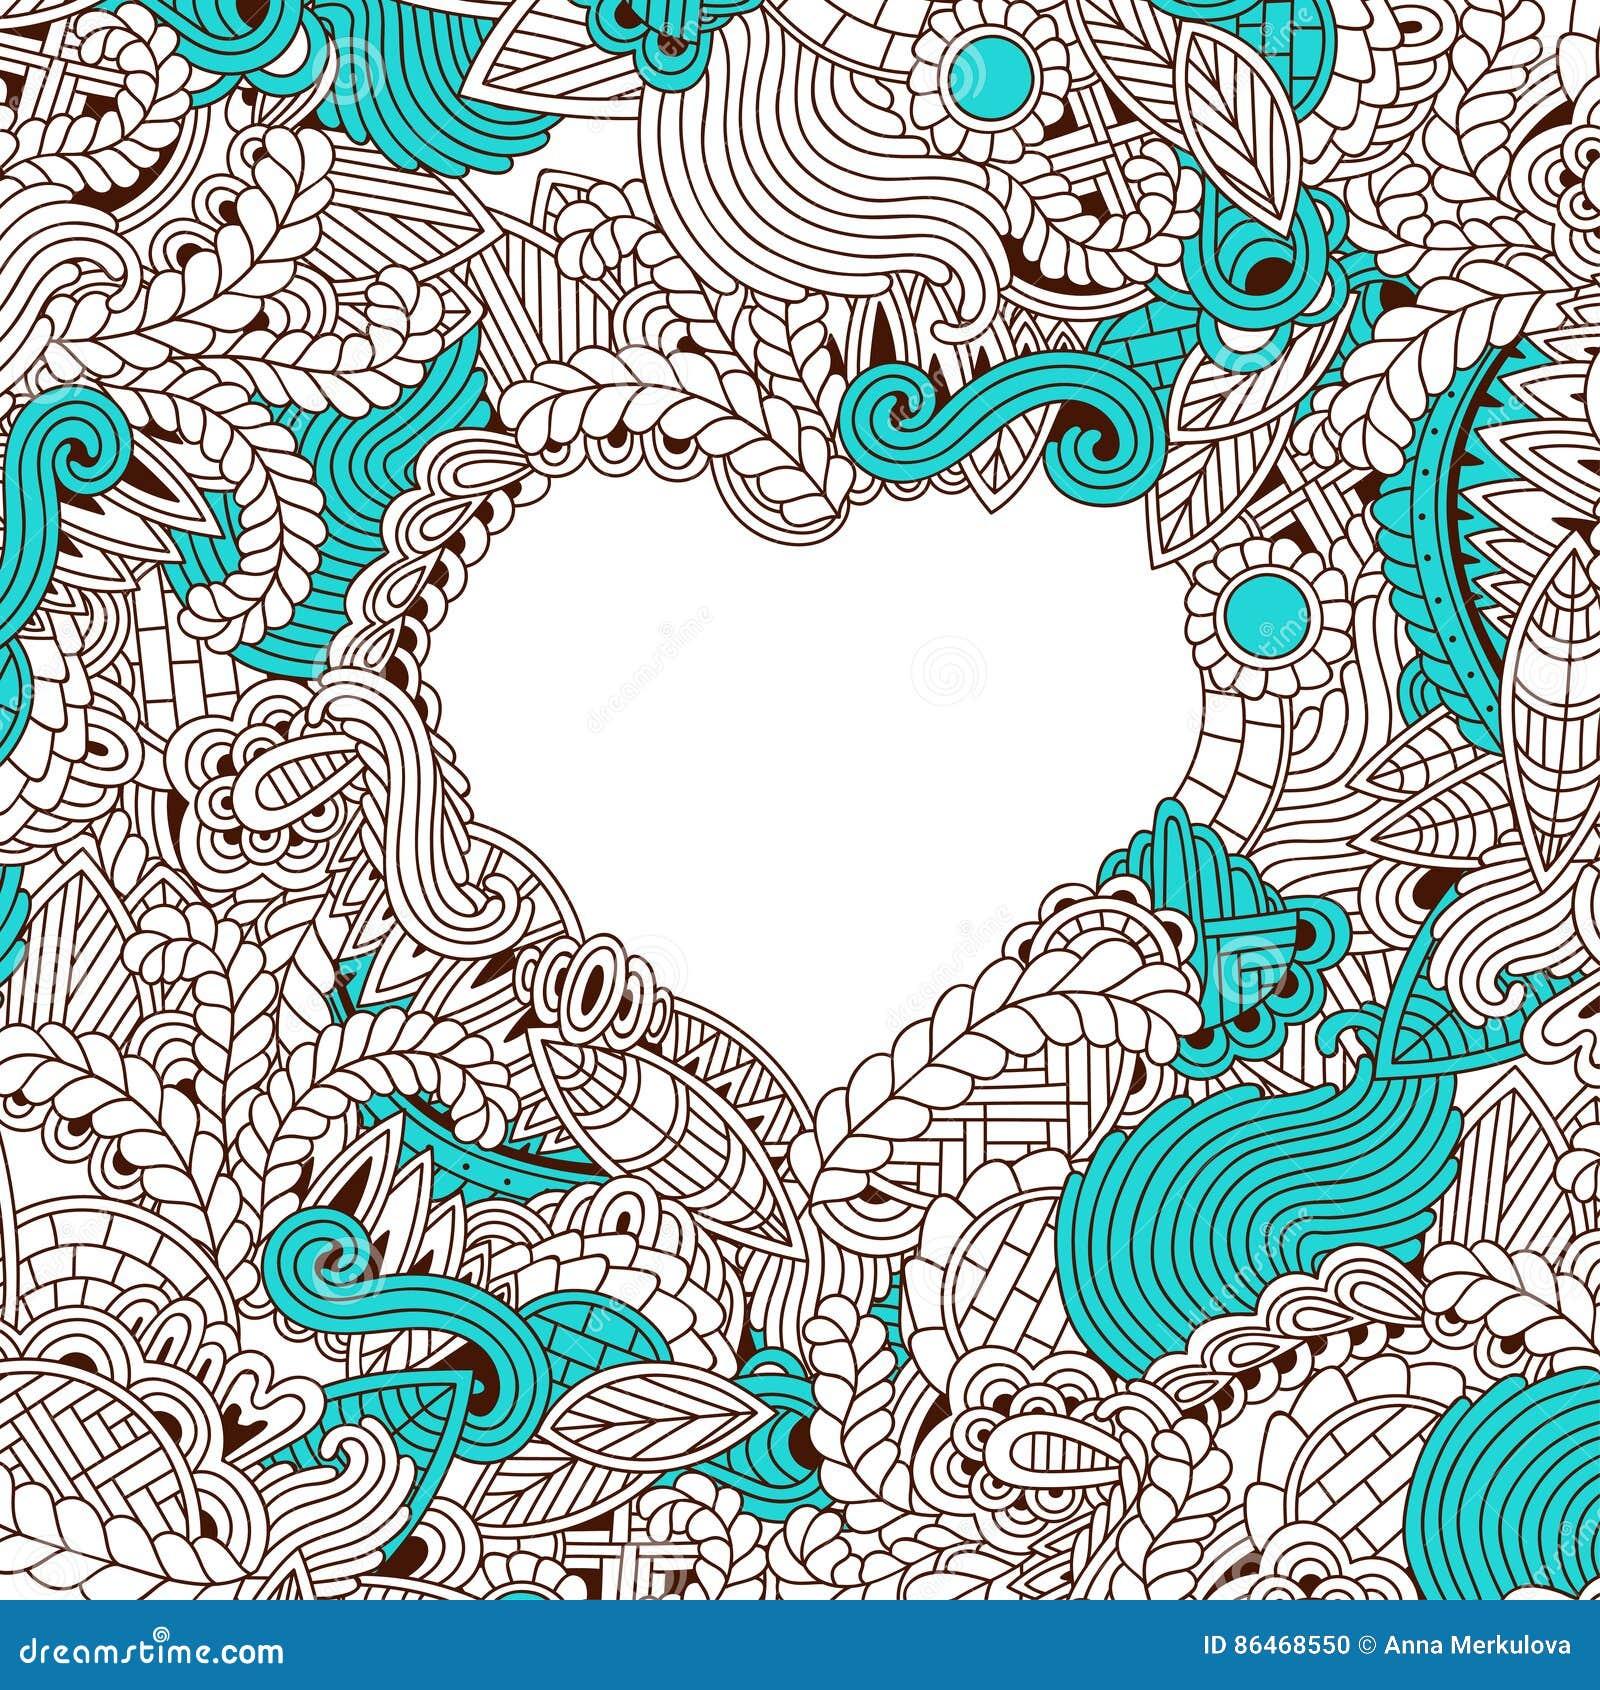 Wedding Card Design Line Art : Zendoodle design of heart shape stock vector